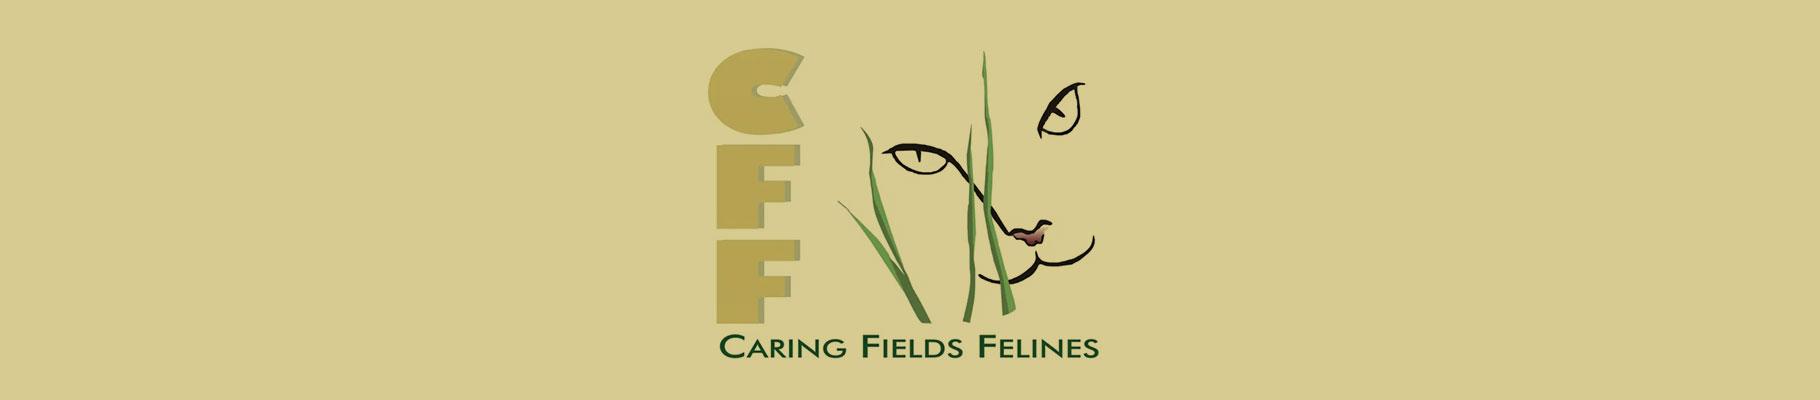 Caring Fields Felines – Local Charity Spotlight